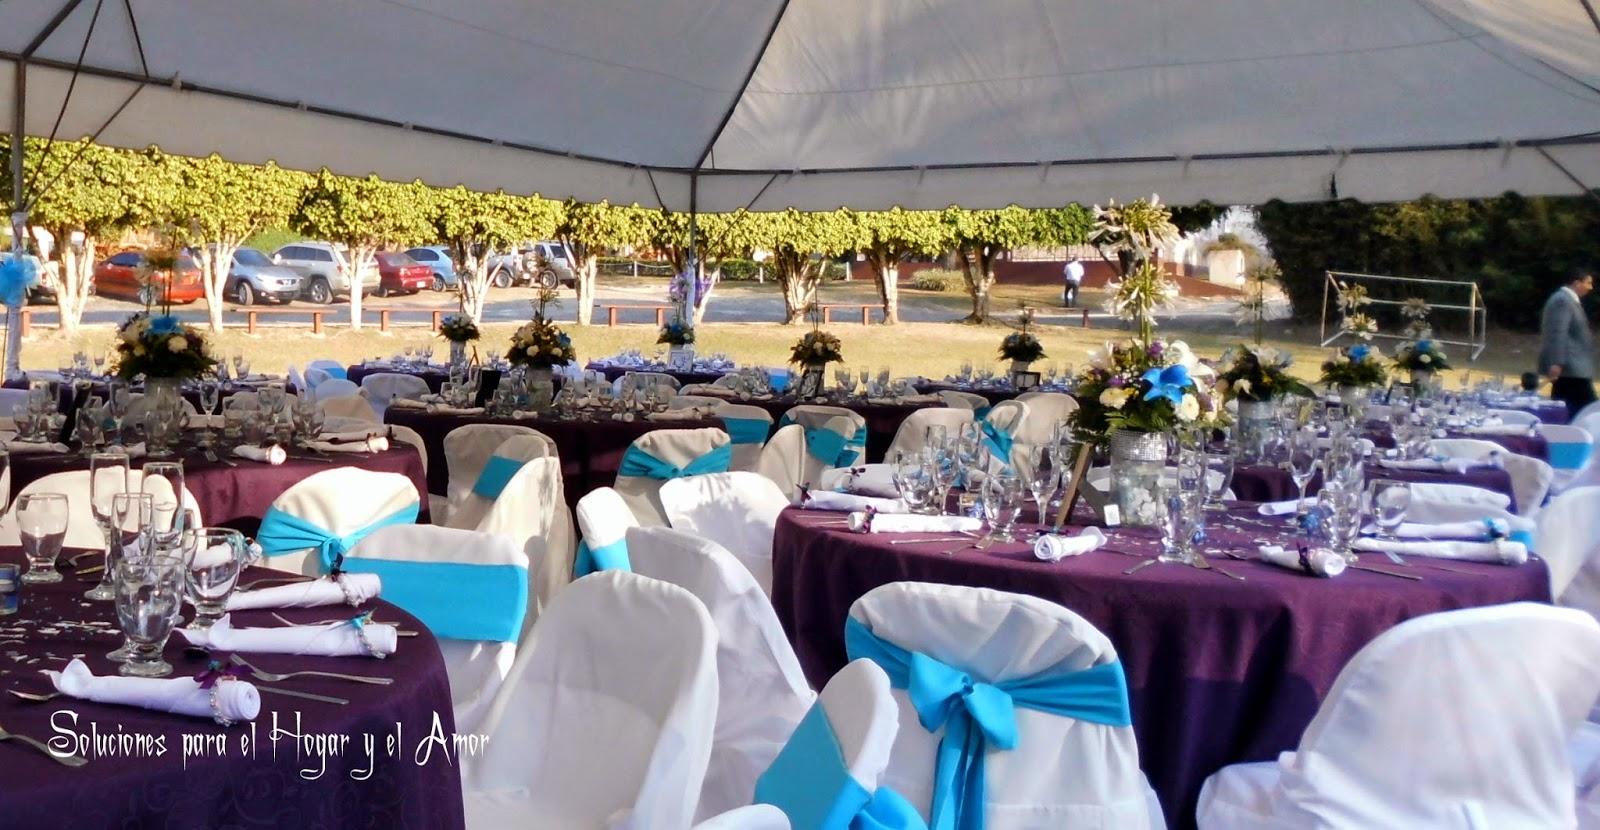 Mesas de recepción de boda, decoración